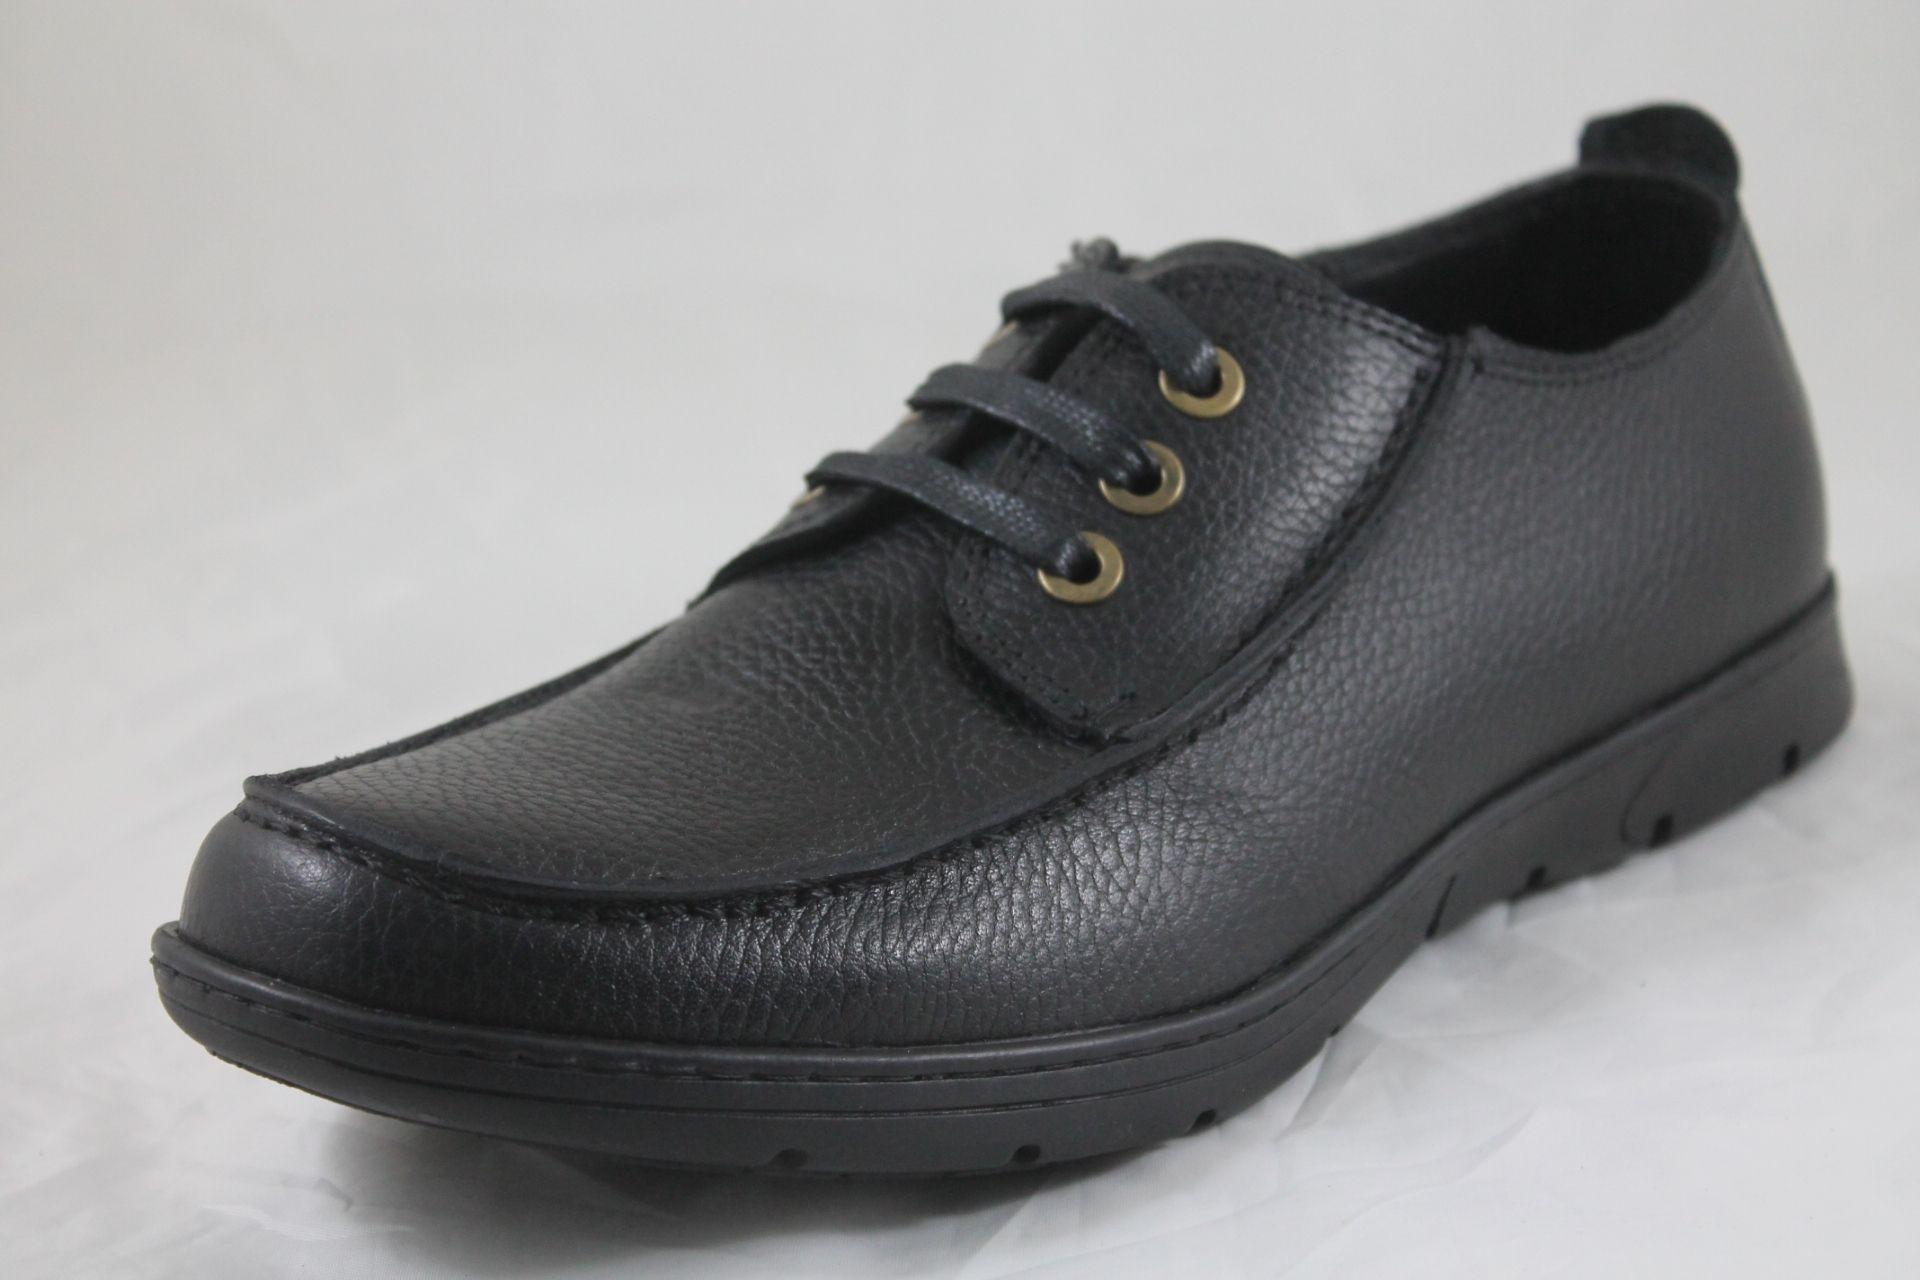 0958ea520 سعر Shoebox حذاء كاجوال جلد طبيعى - اسود فى مصر | جوميا | أحذية ...